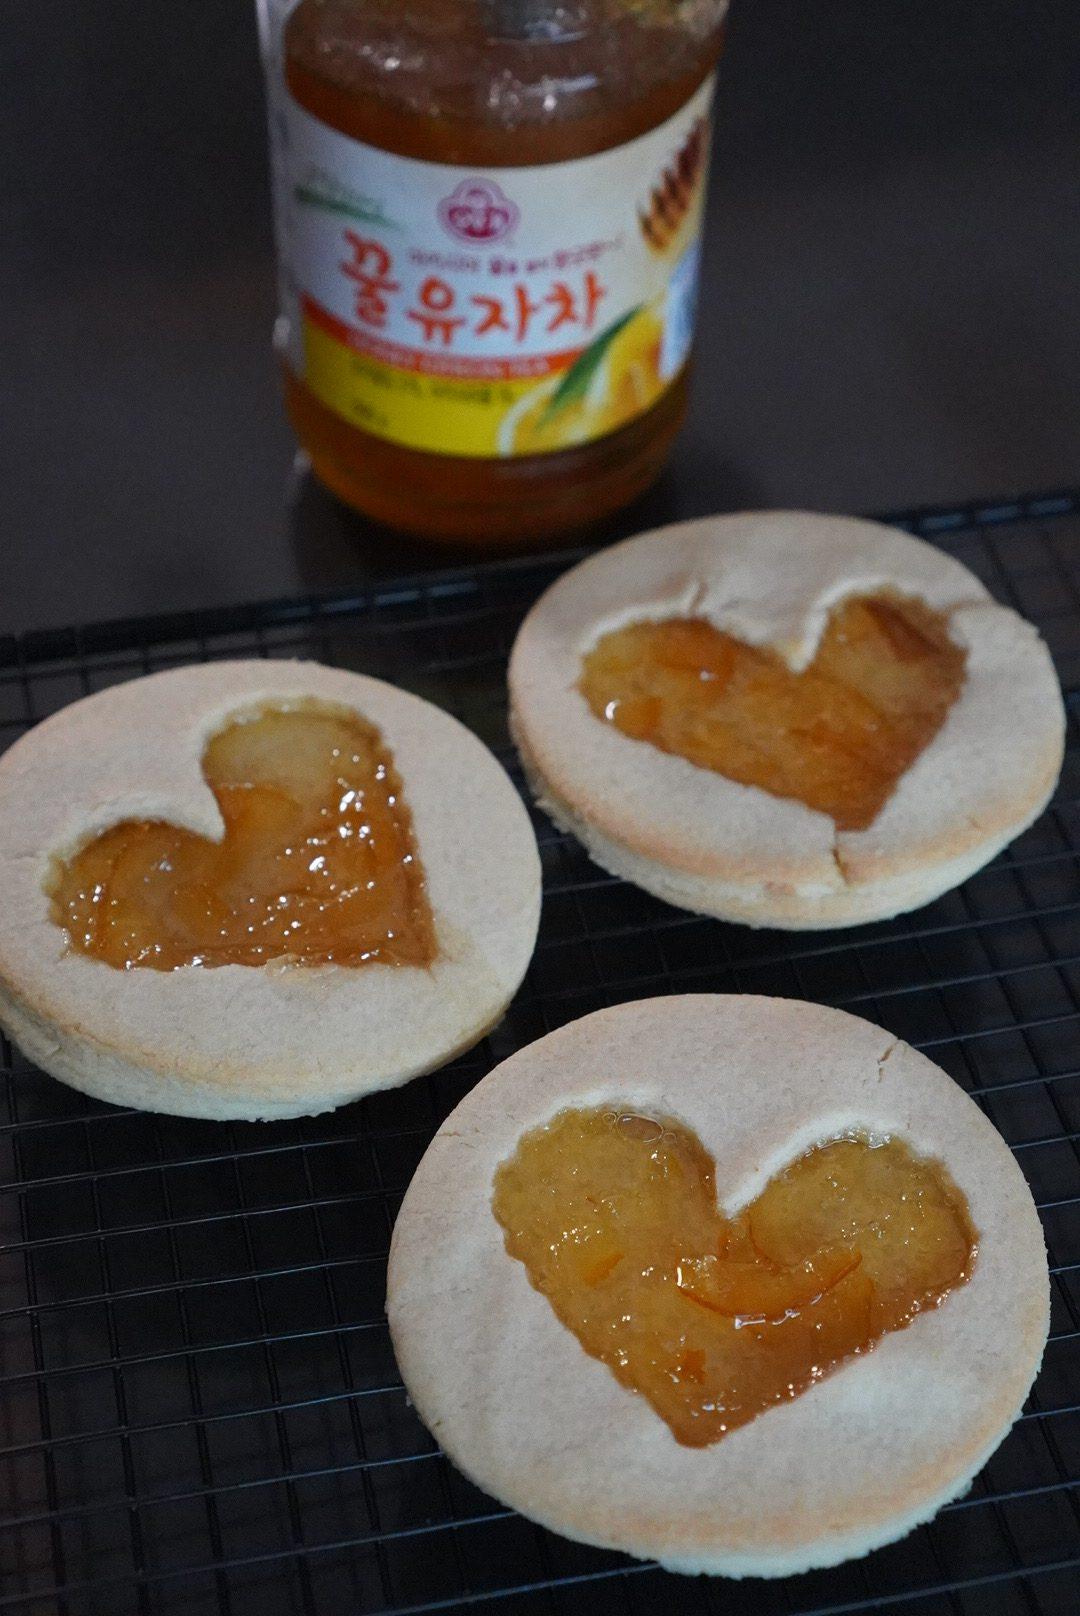 https://k-foodfan.com/wp-content/uploads/2020/11/DSC05392-copie-rotated.jpg